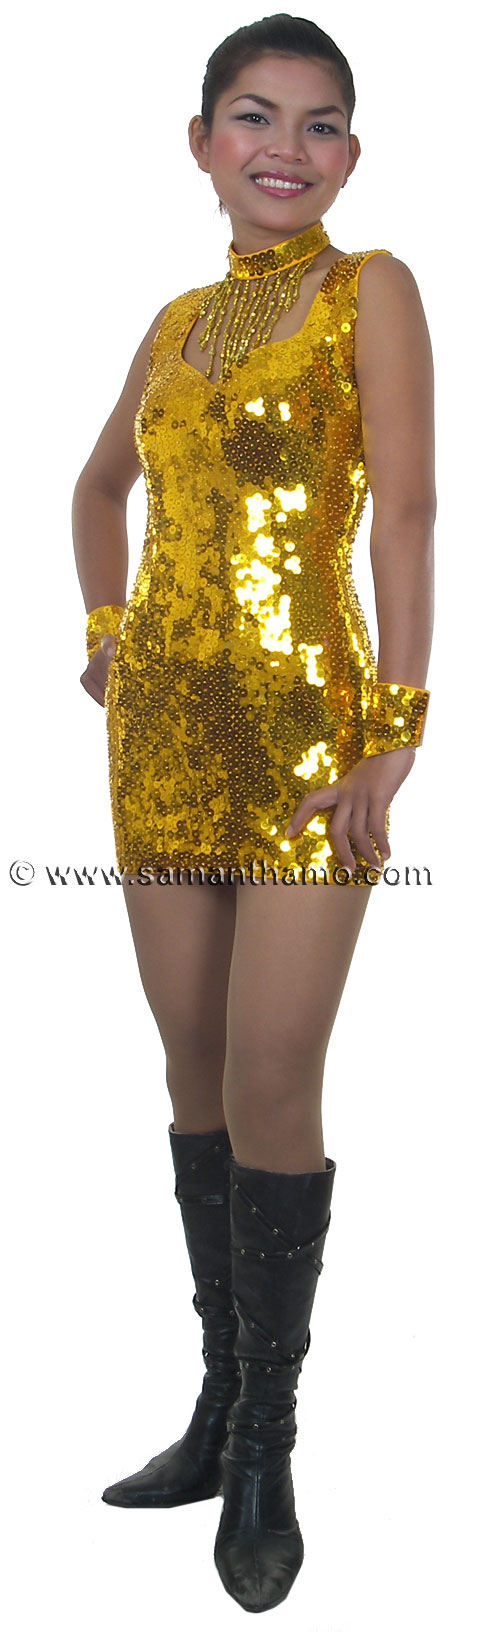 Sequin-Dresses/CT508-mini-gold-sequin-dress.jpg